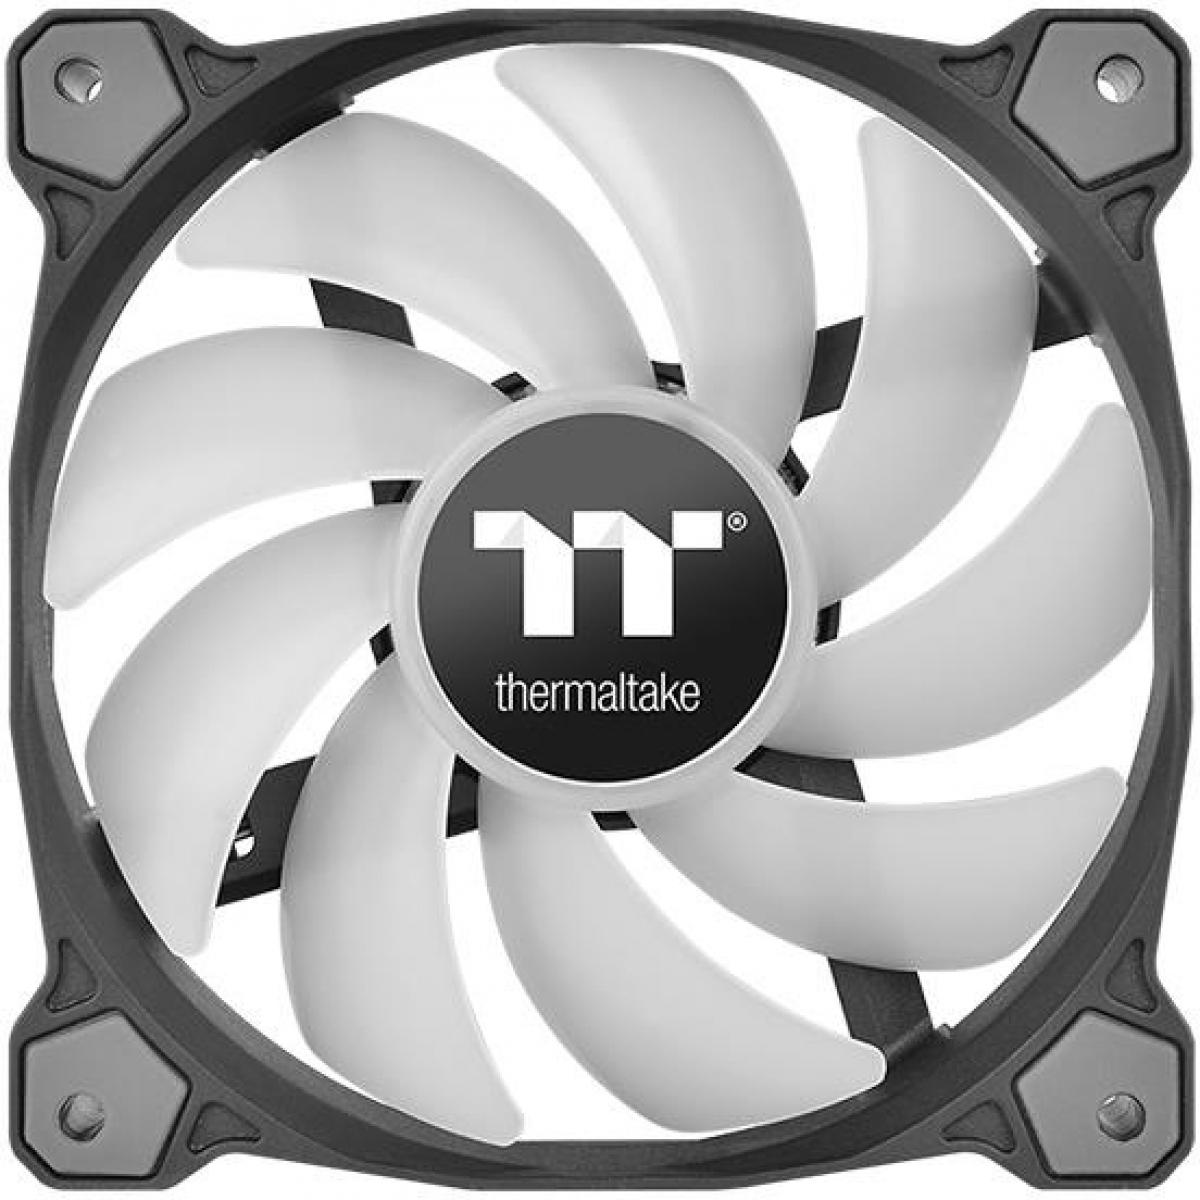 Kit Fan com 3 Unidades Thermaltake Pure 12, ARGB Sync 120mm, com Controlador, CL-F079-PL12SW-A